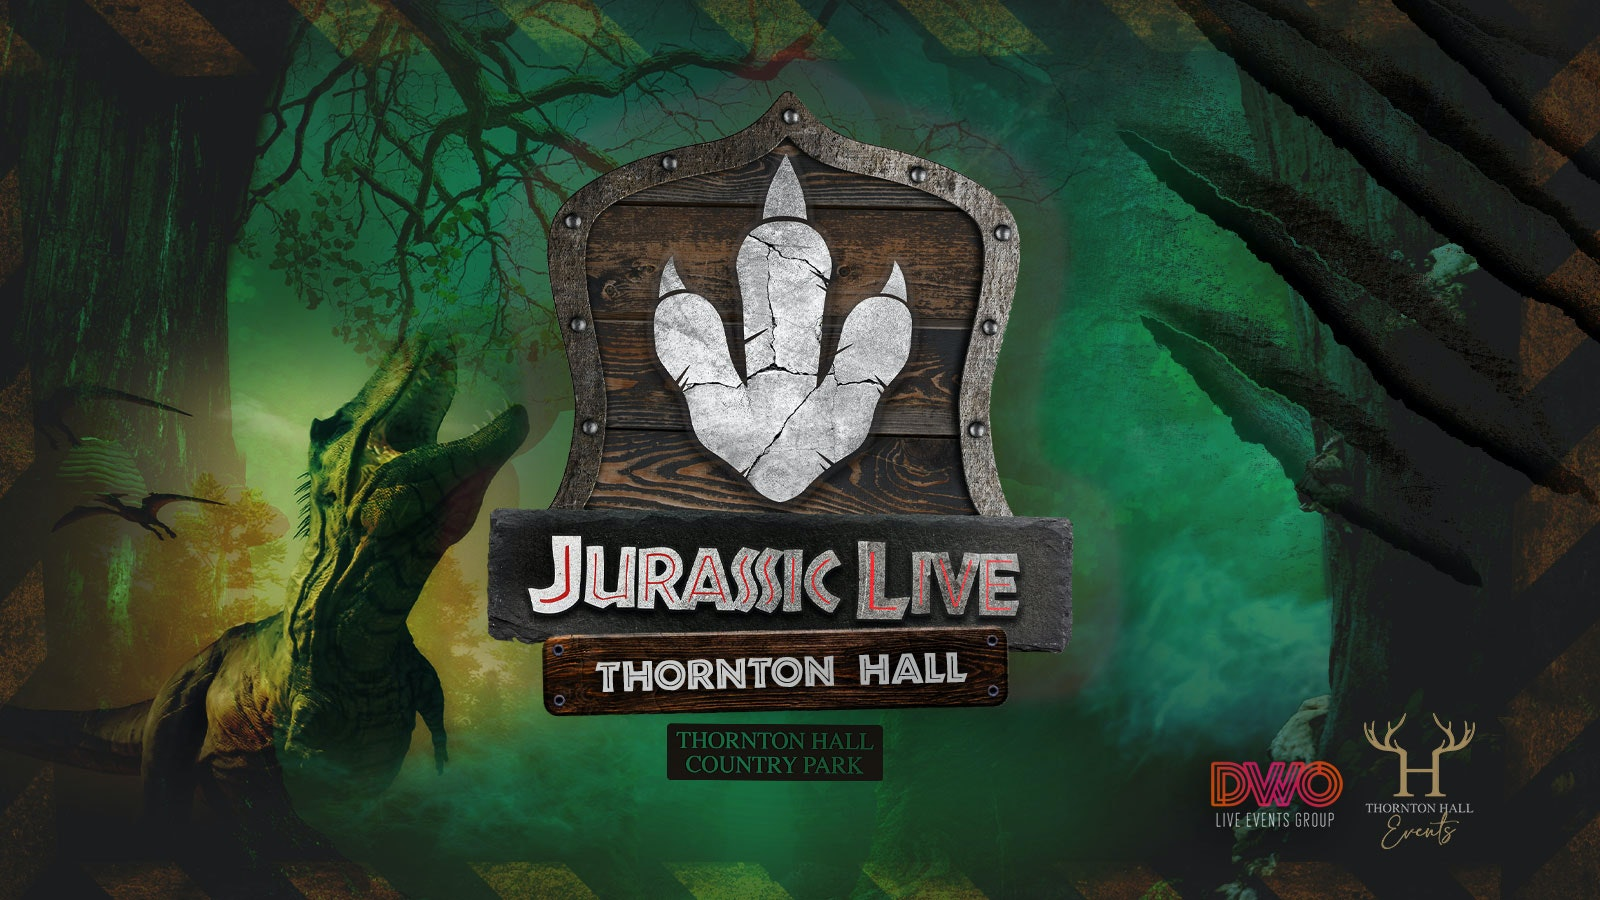 Jurassic Live – Sunday 25th April – 4pm